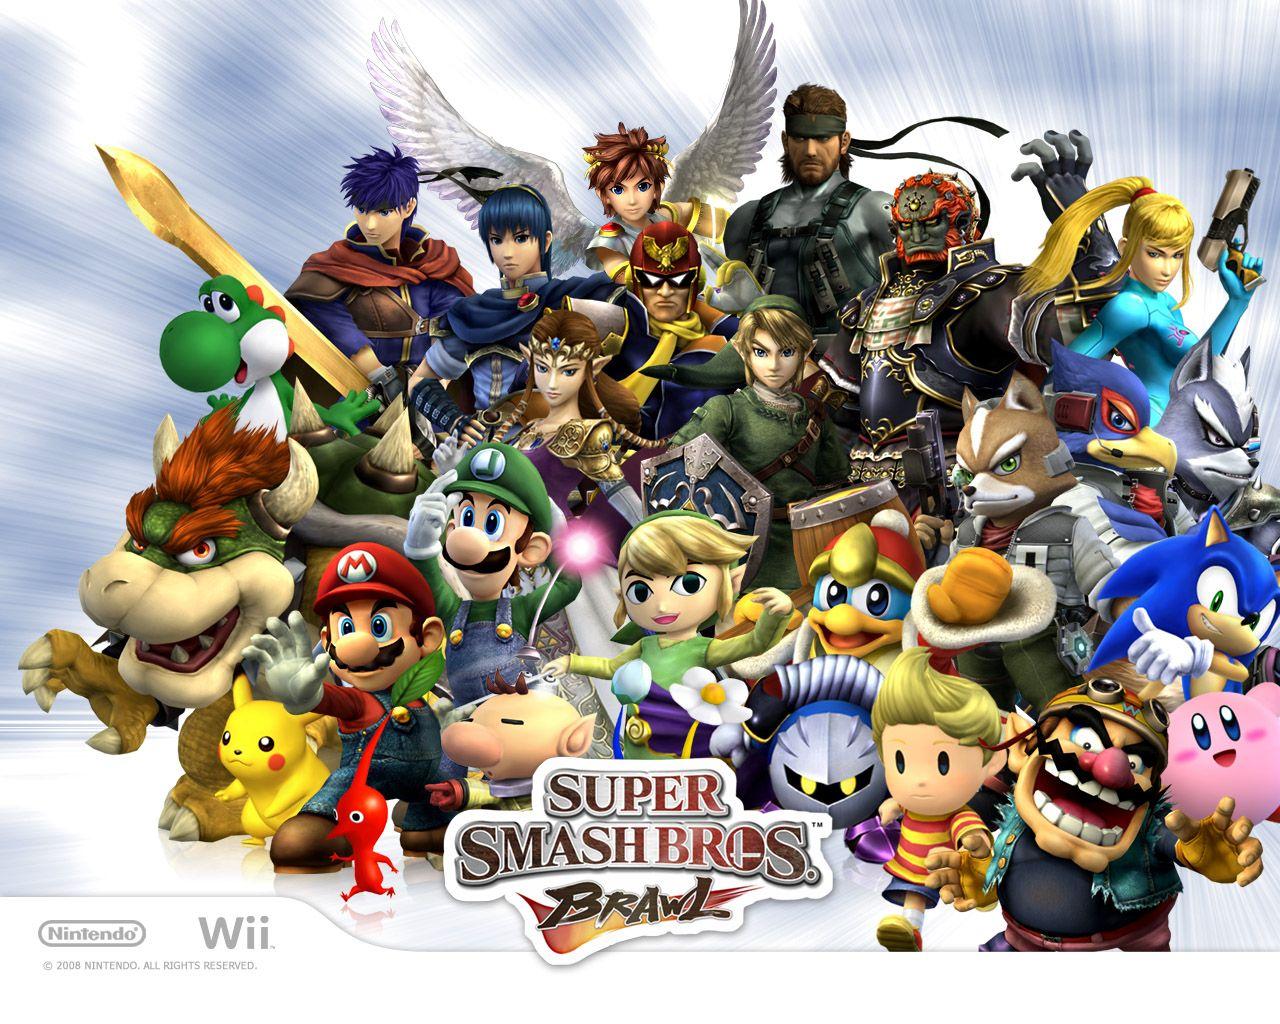 Super Smash Bros Brawl 2008 Nintendo Wii Wallpaper Super